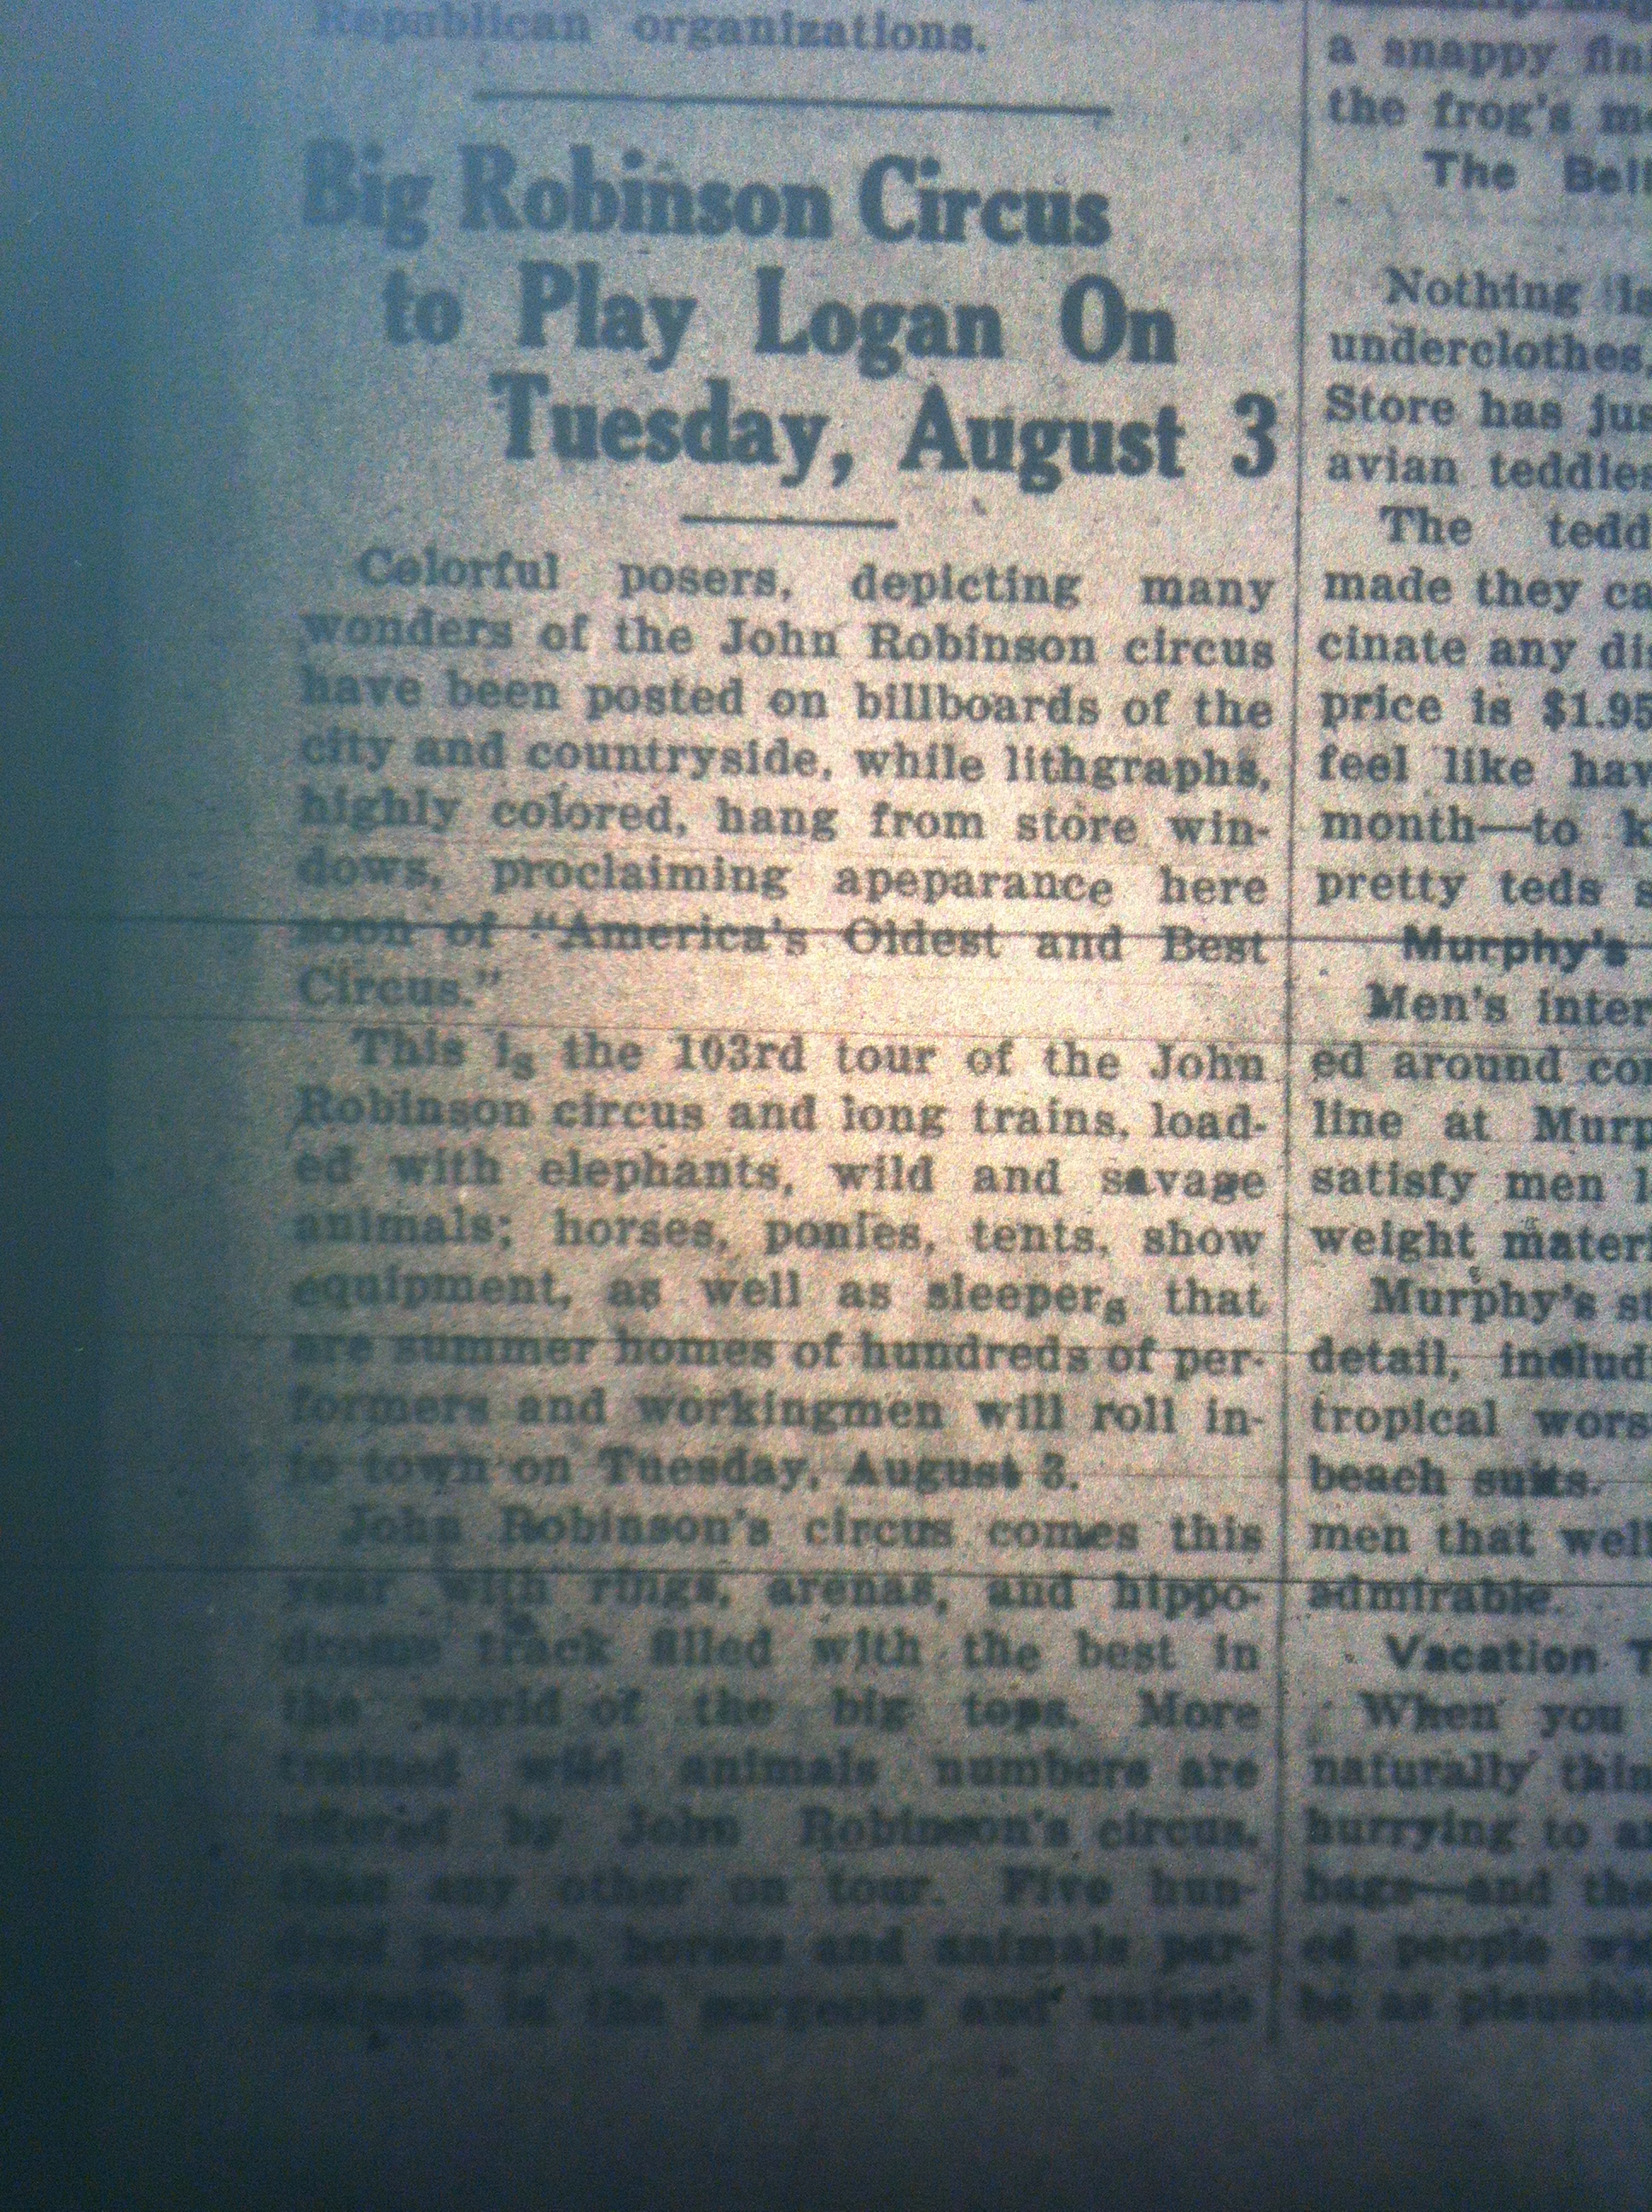 Circus in Logan LB 07.20.1926 1